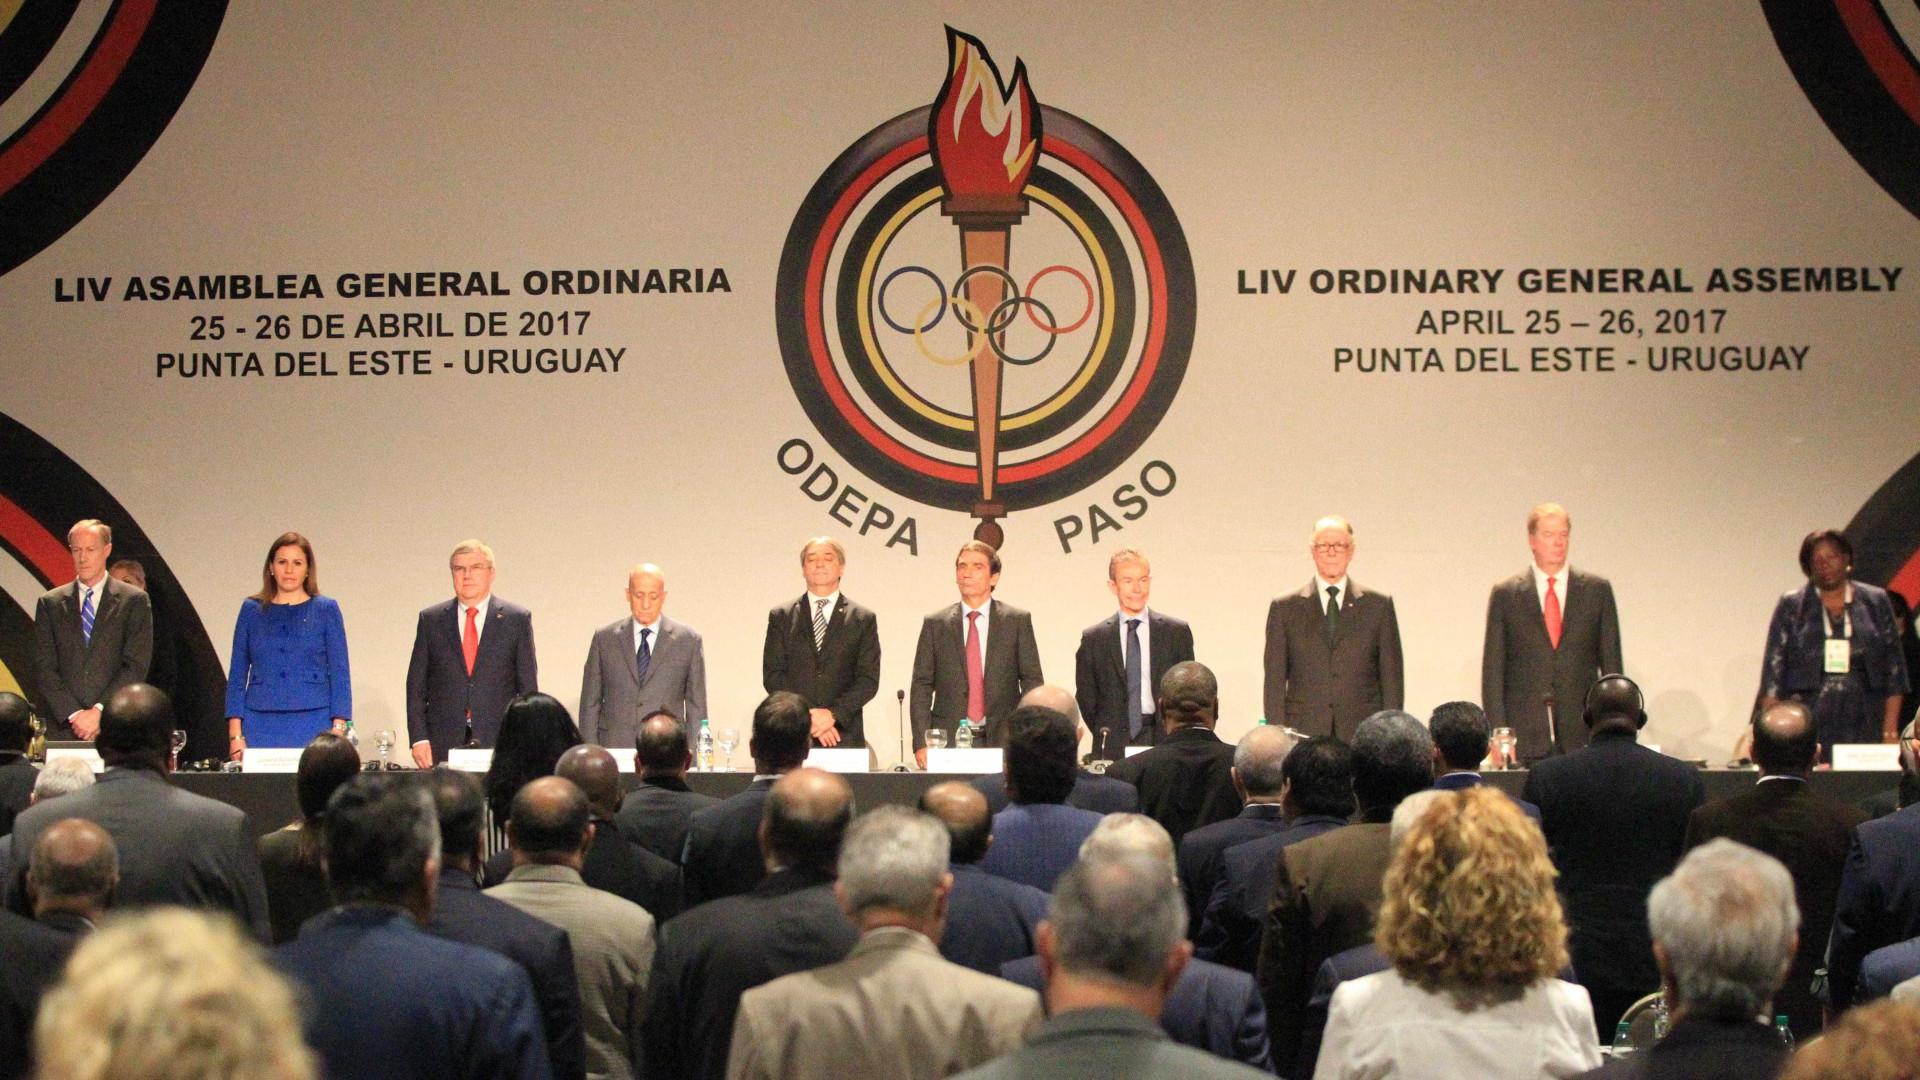 Carlos Nuzman apresenta demissão do Comité Olímpico Brasileiro